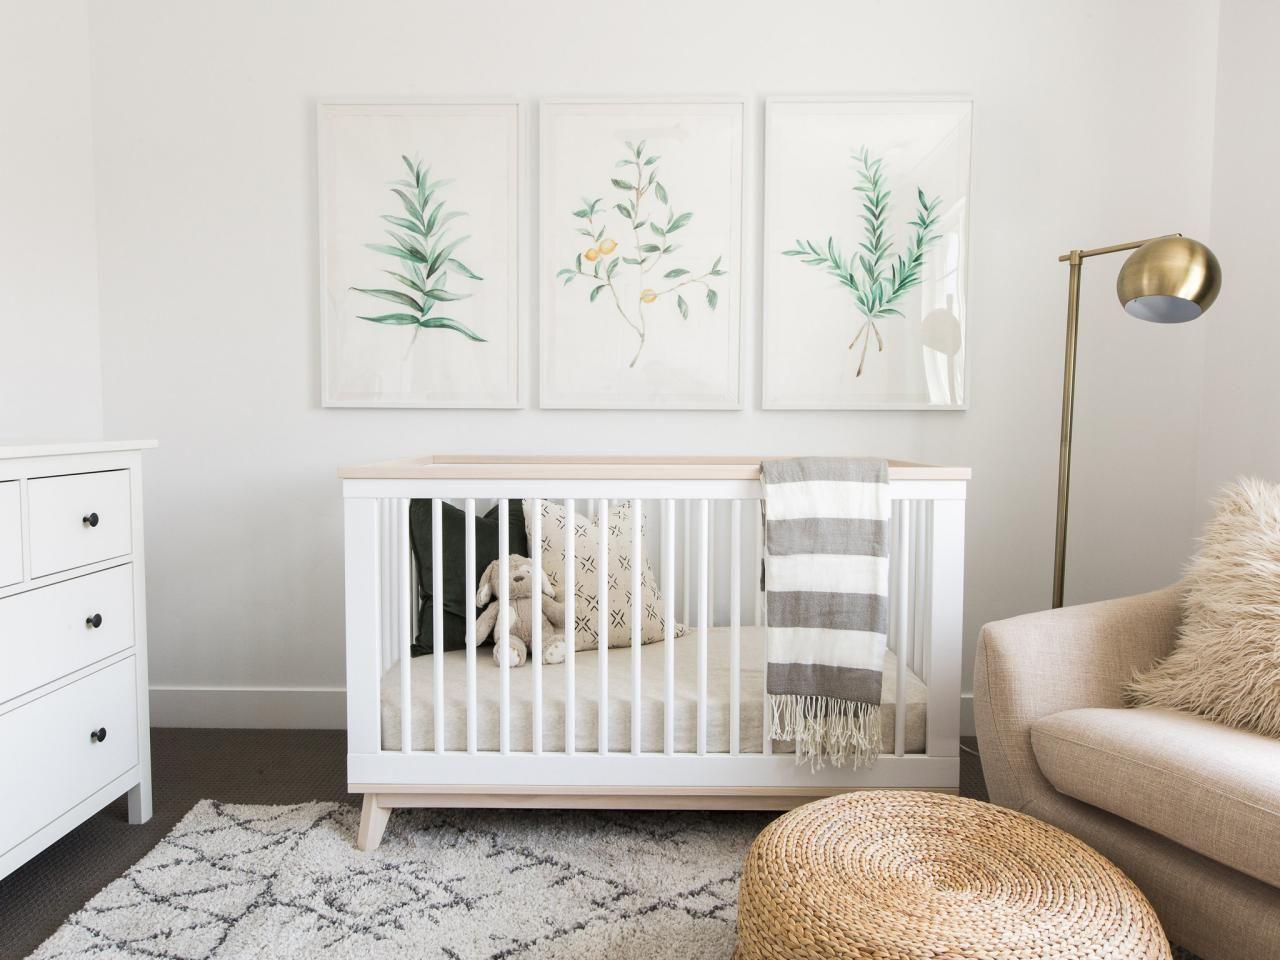 12 Cute Ways to Store + Display Baby Things in Your Nursery